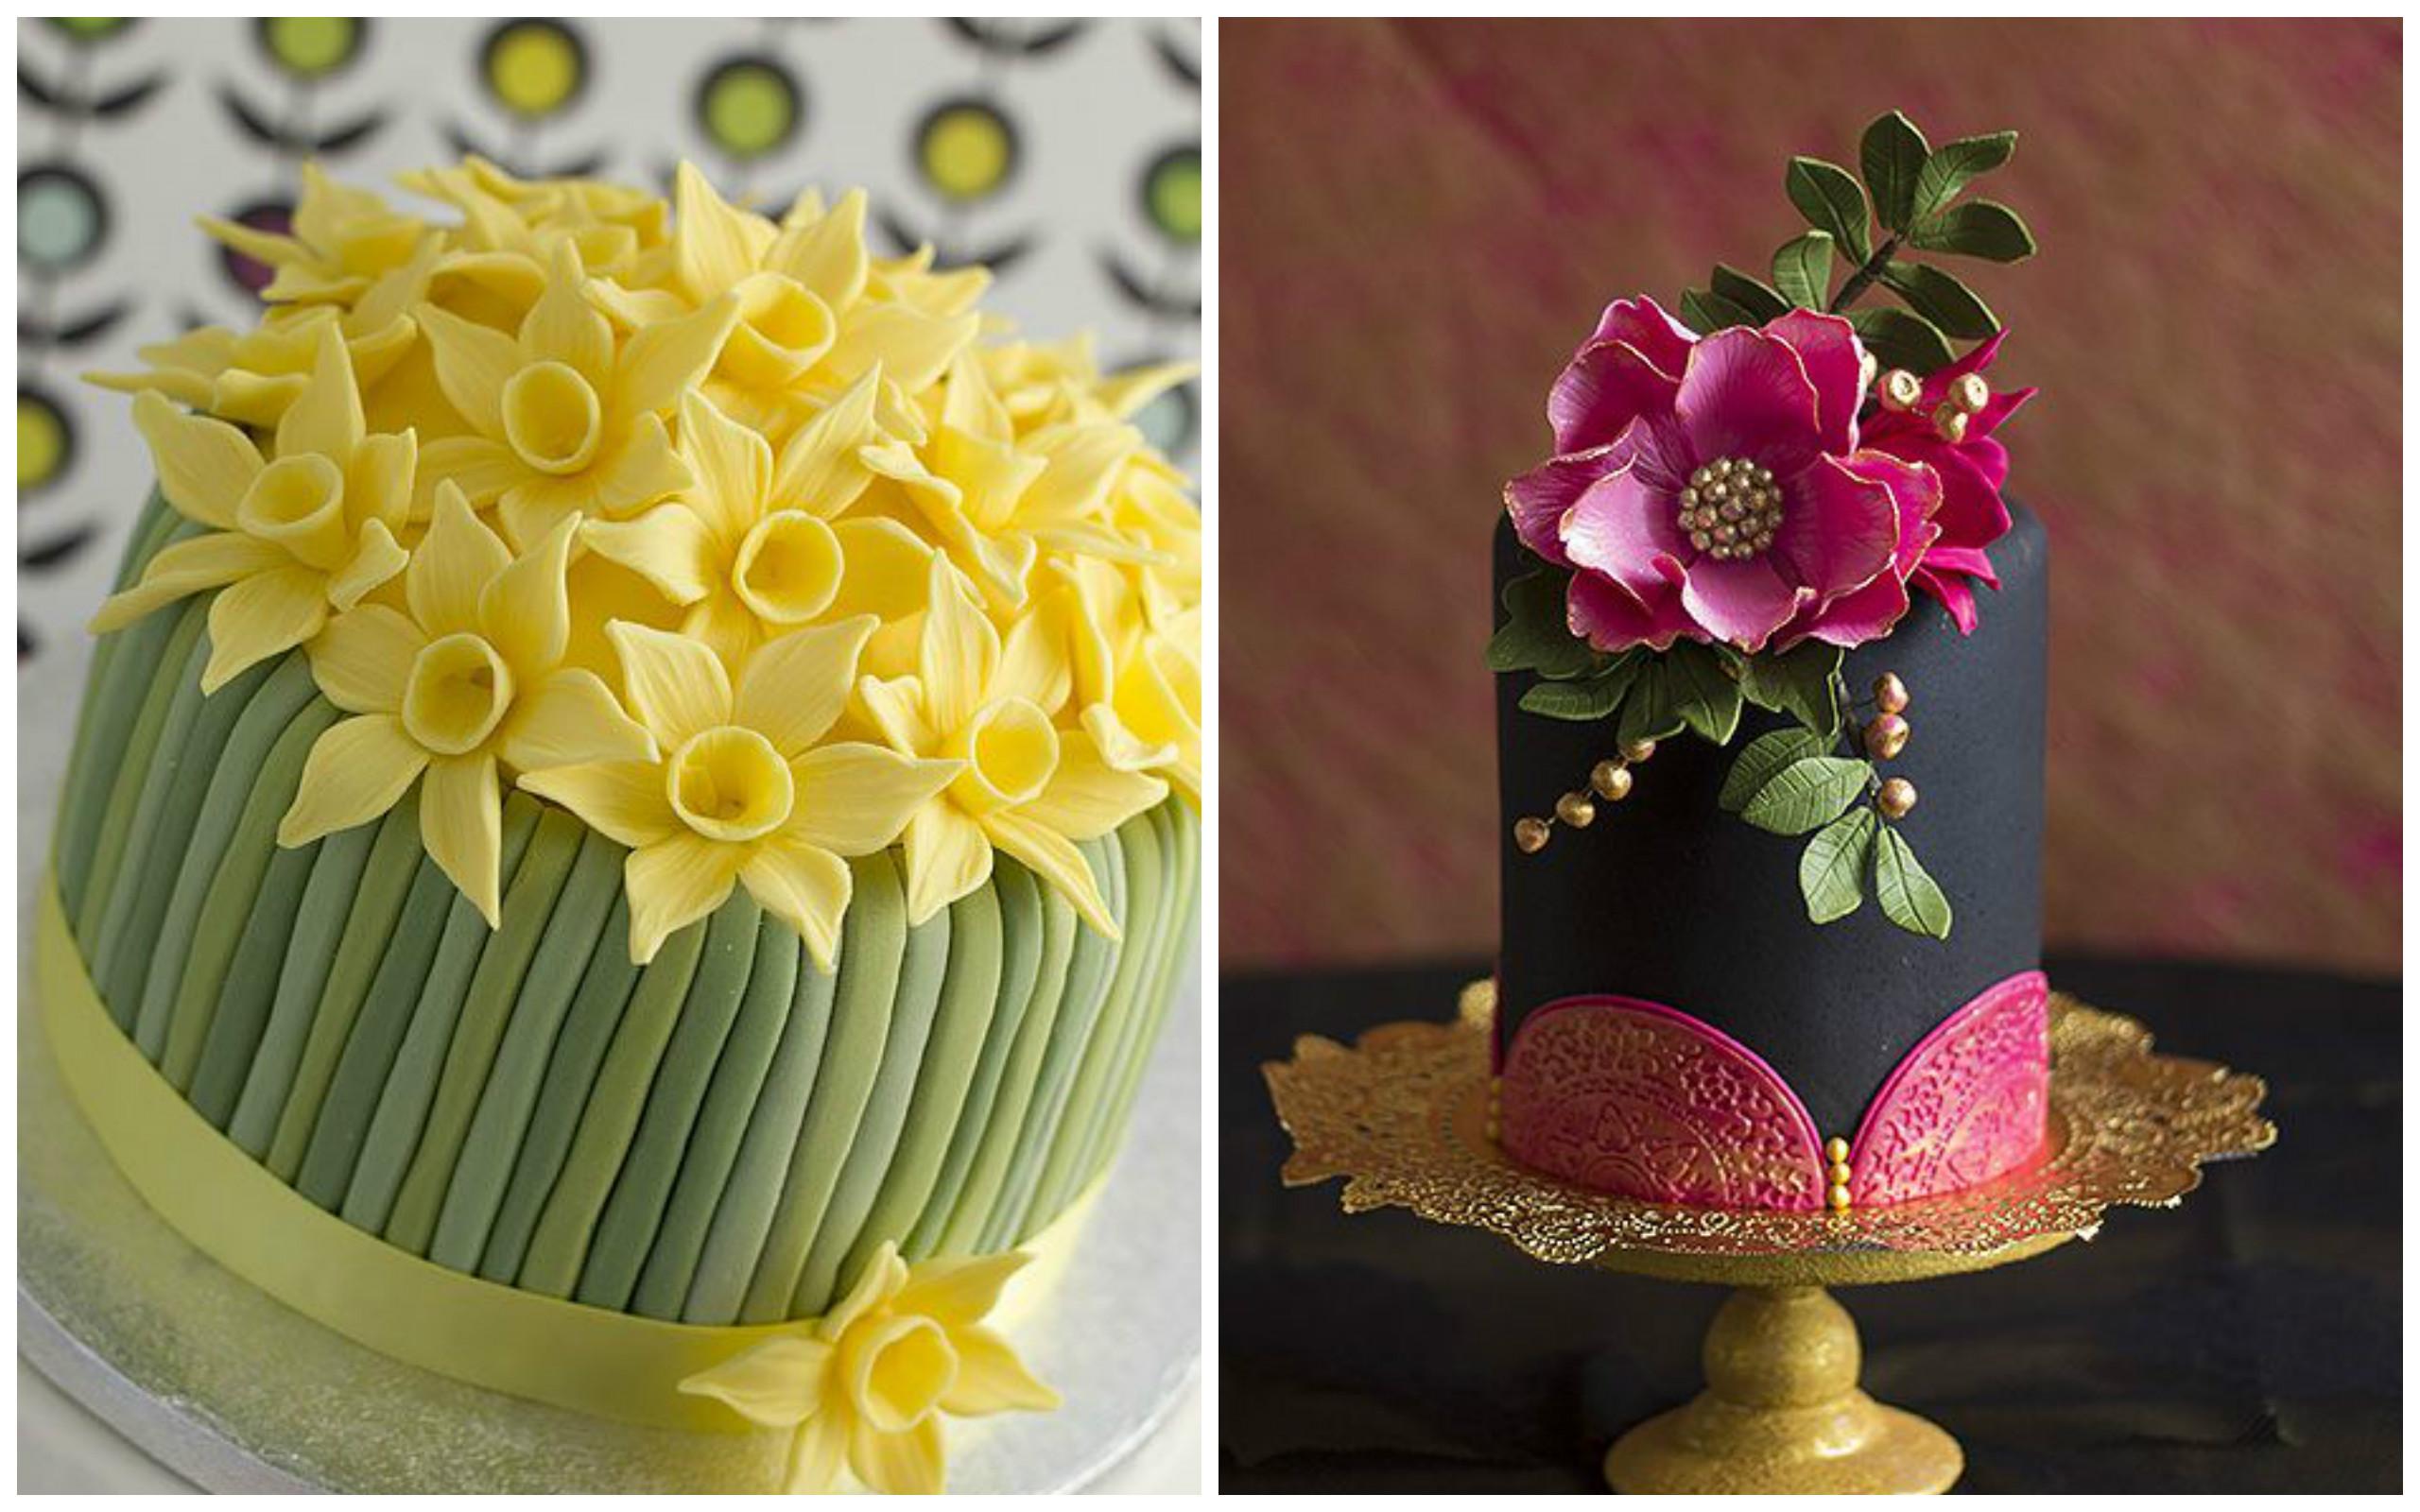 Top 20 Fabulous Flower Cakes